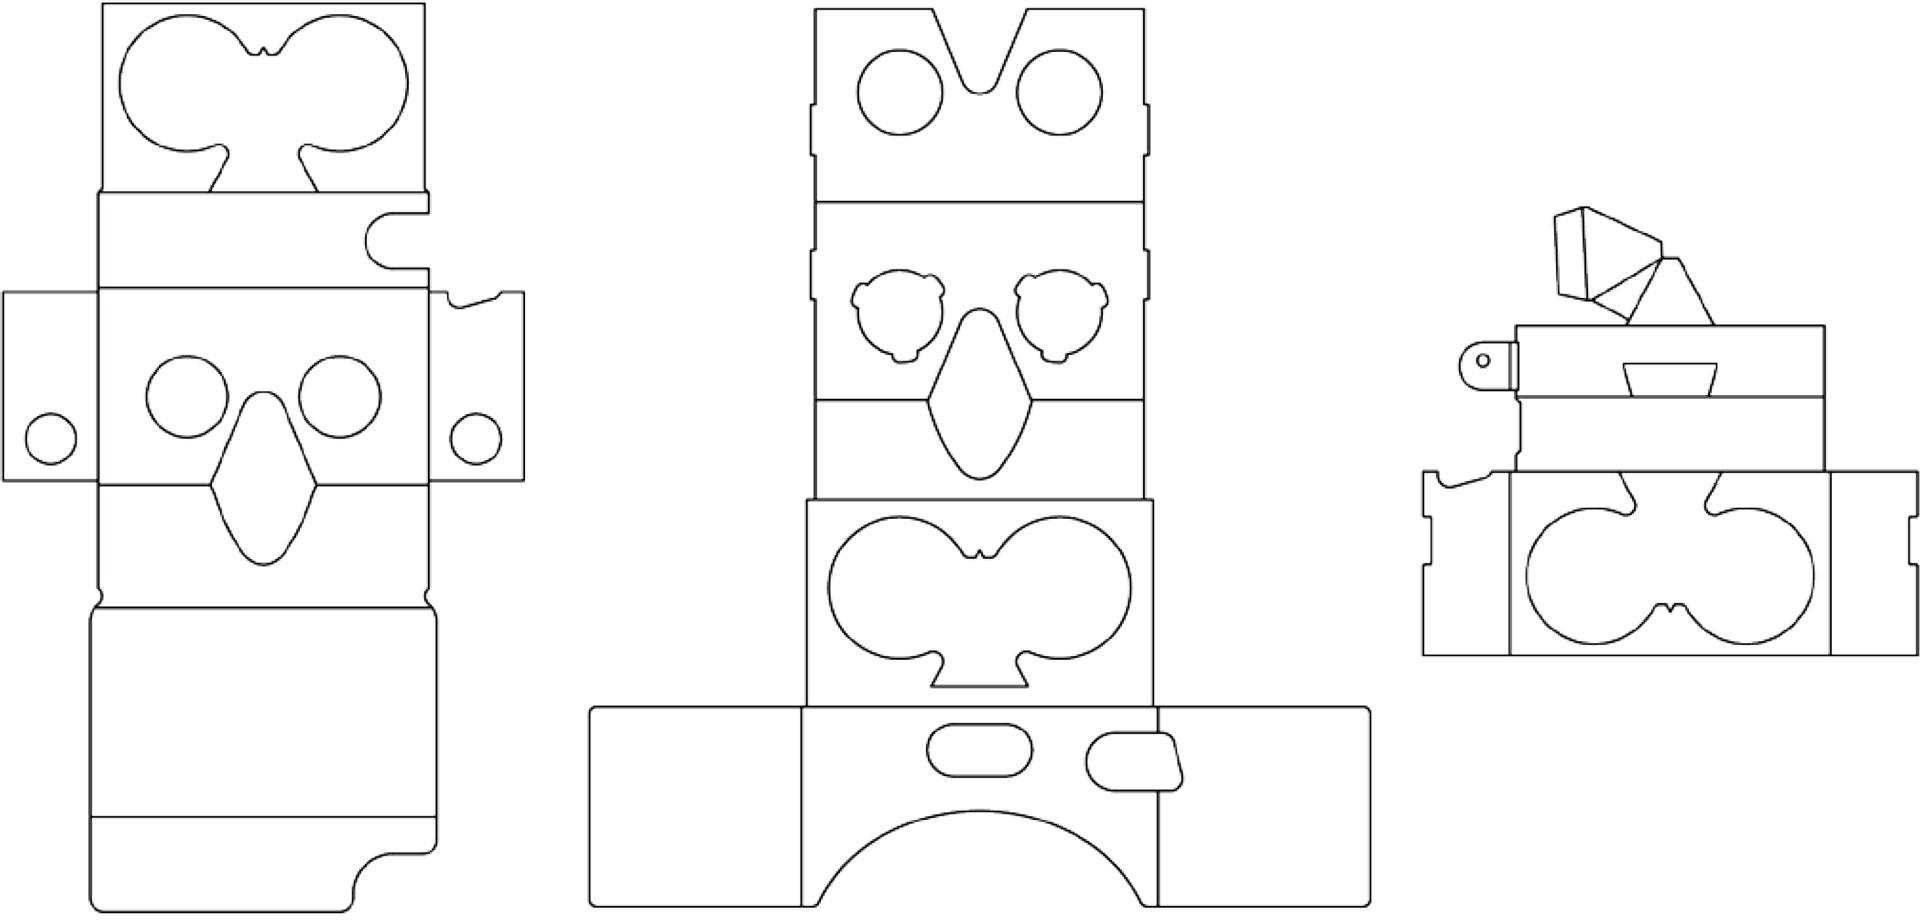 Google cardboard plan